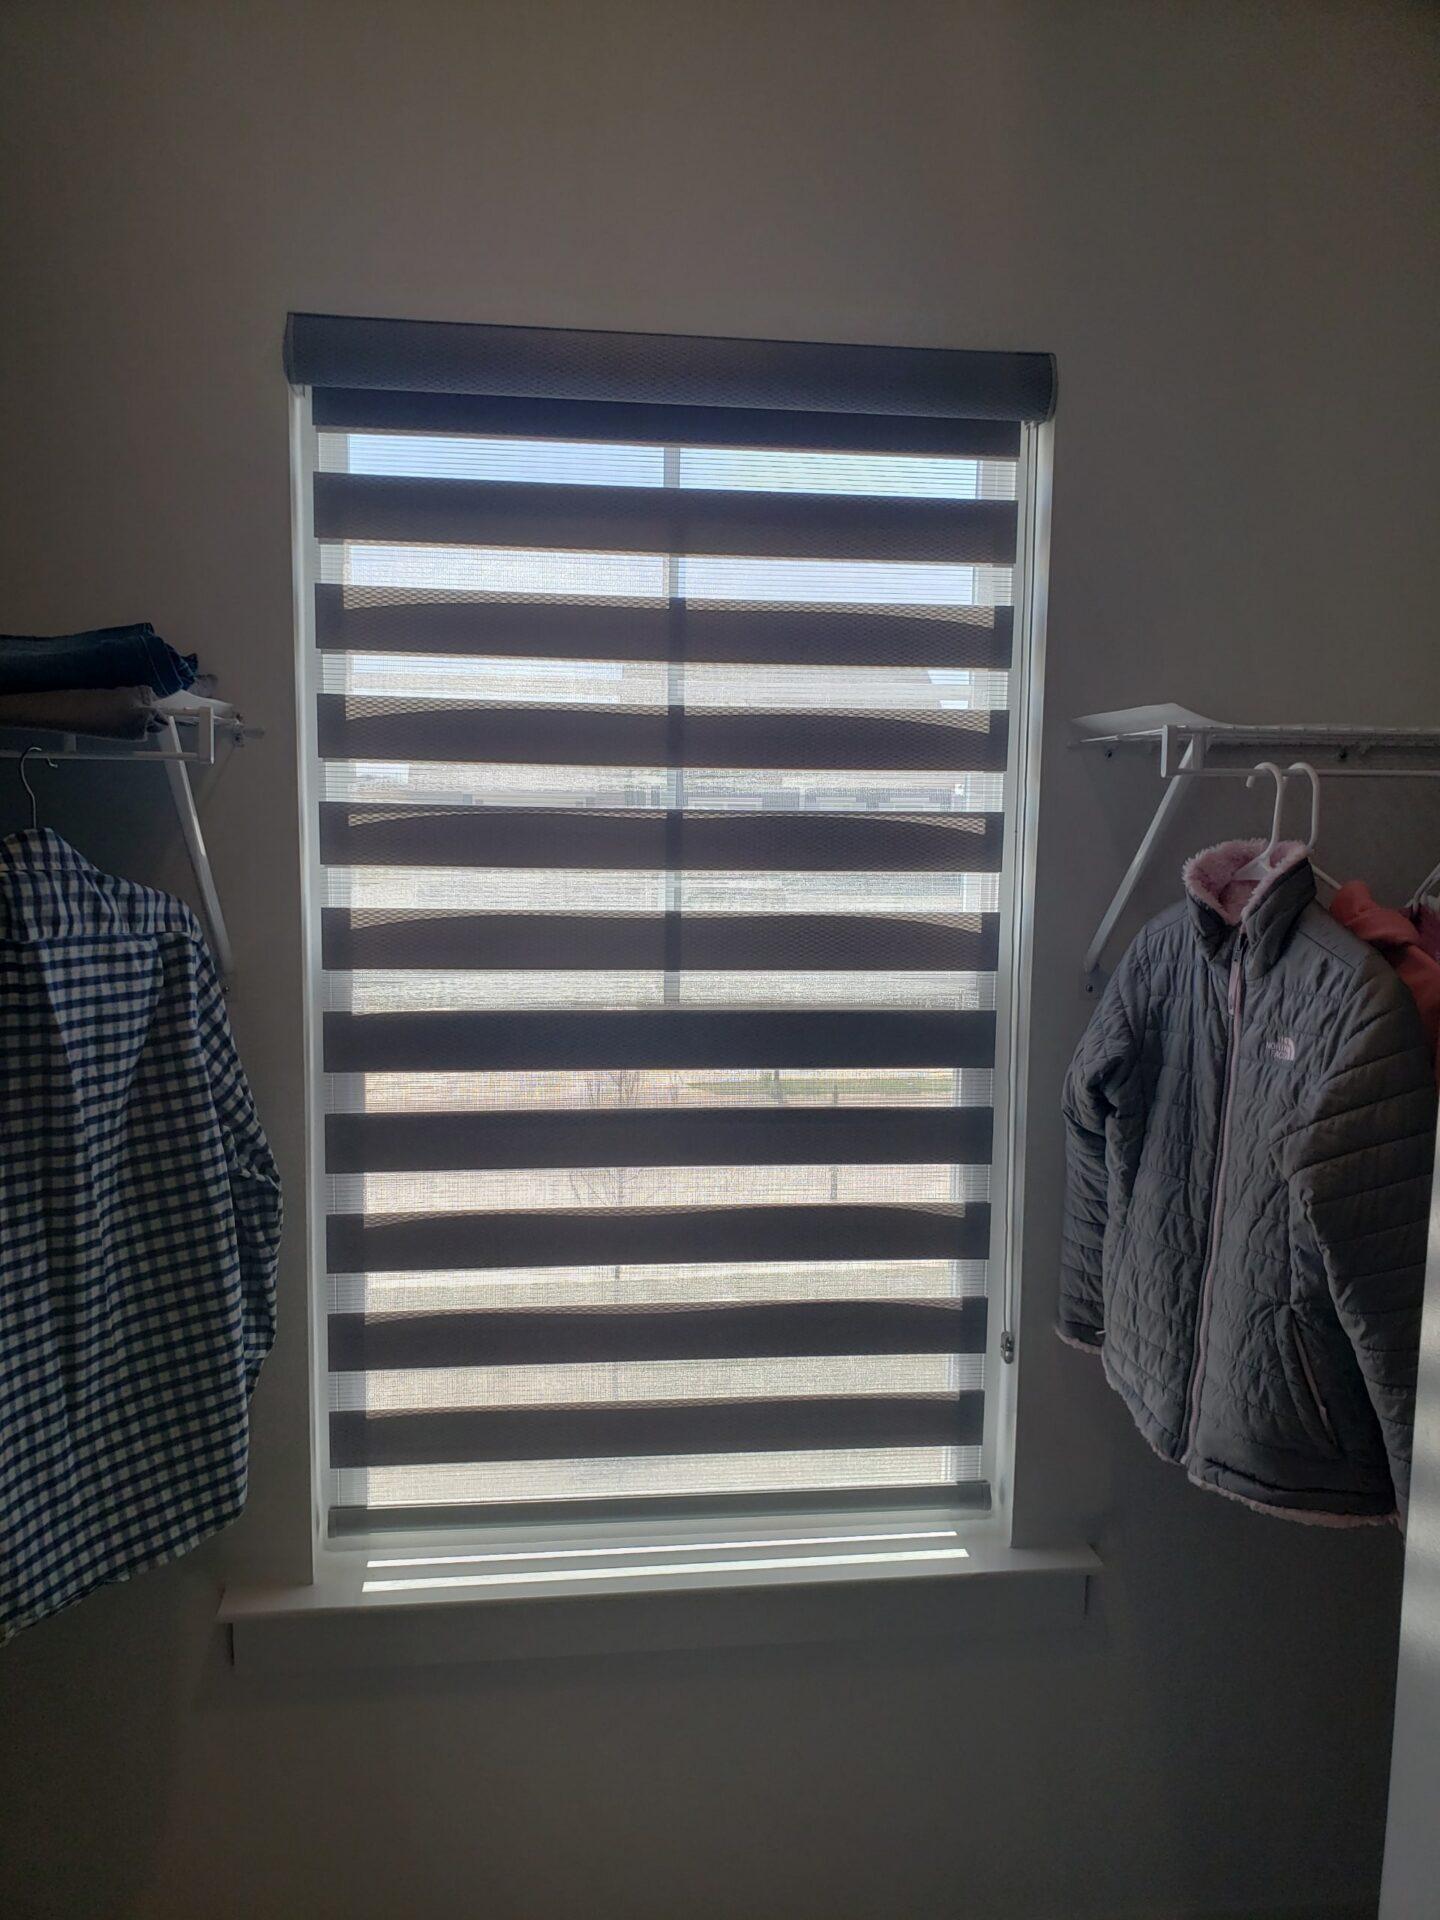 Layered Shades - Interior Window Plantation Shutters - Custom, Motorized Window Treatments, Blind Repair, Custom Blinds | Nashville, TN